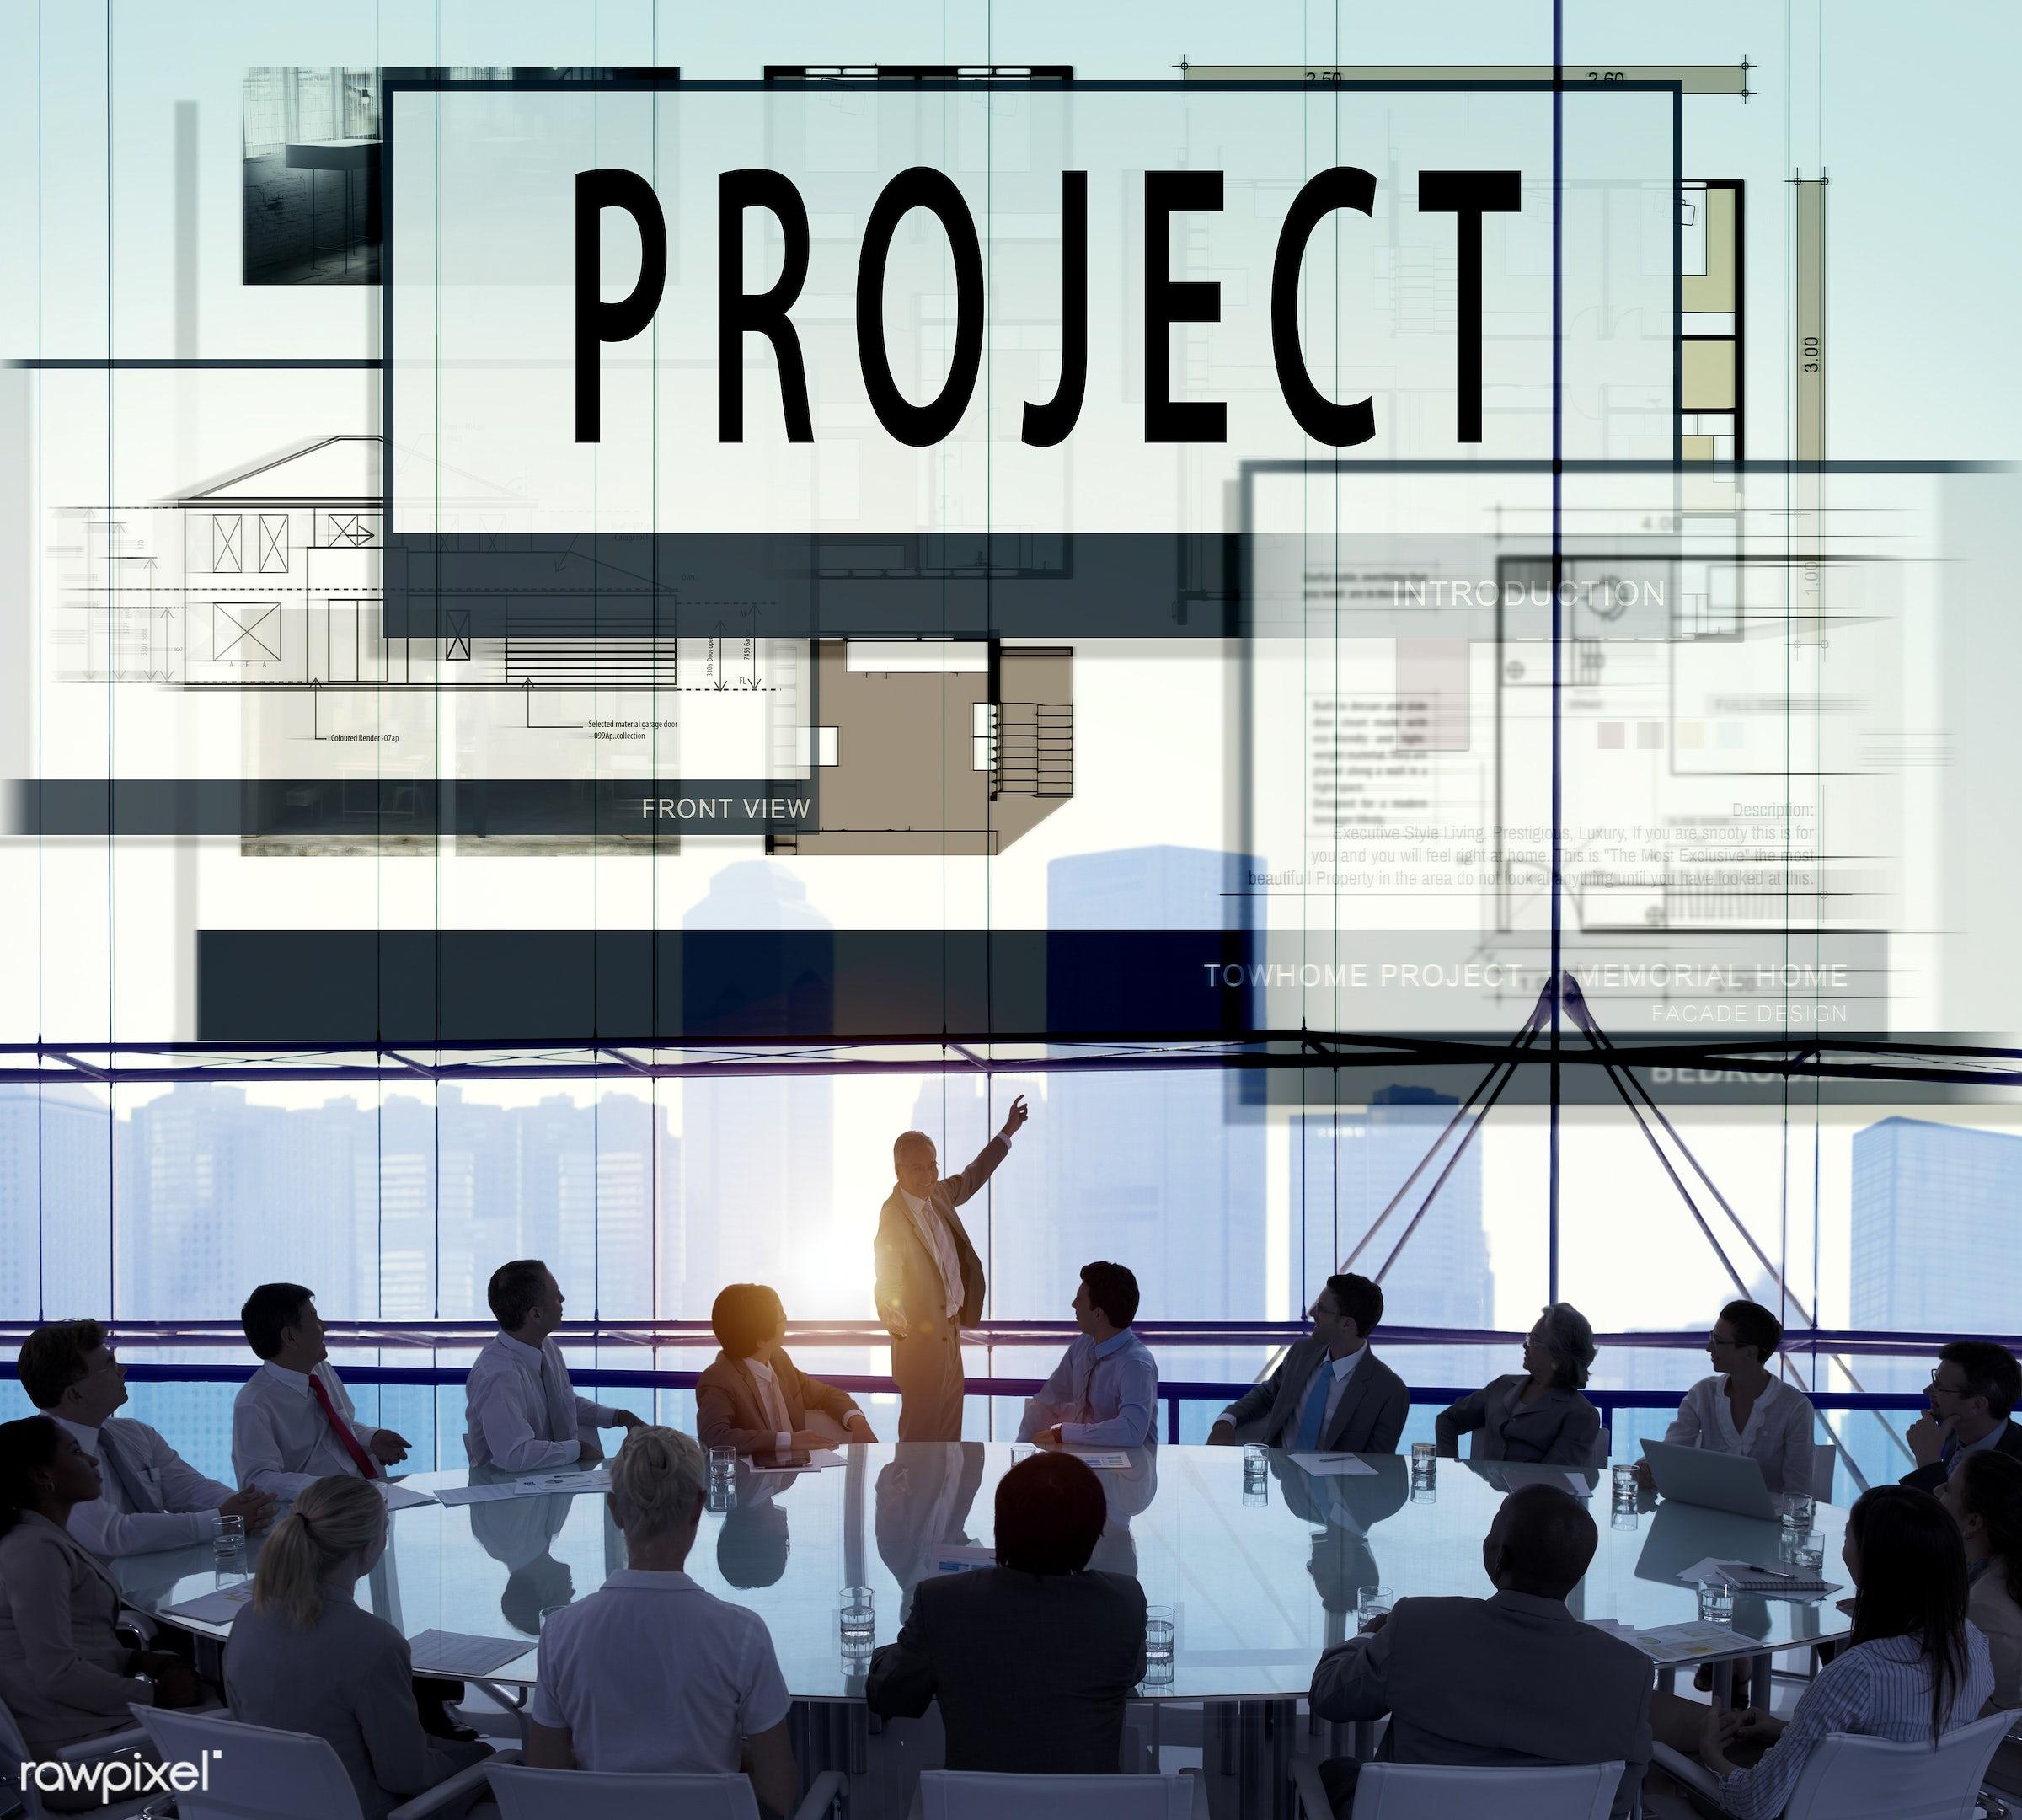 meeting, project, engineering, presentation, architecture, art, audience, backlit, blueprint, brainstorm, build, business,...